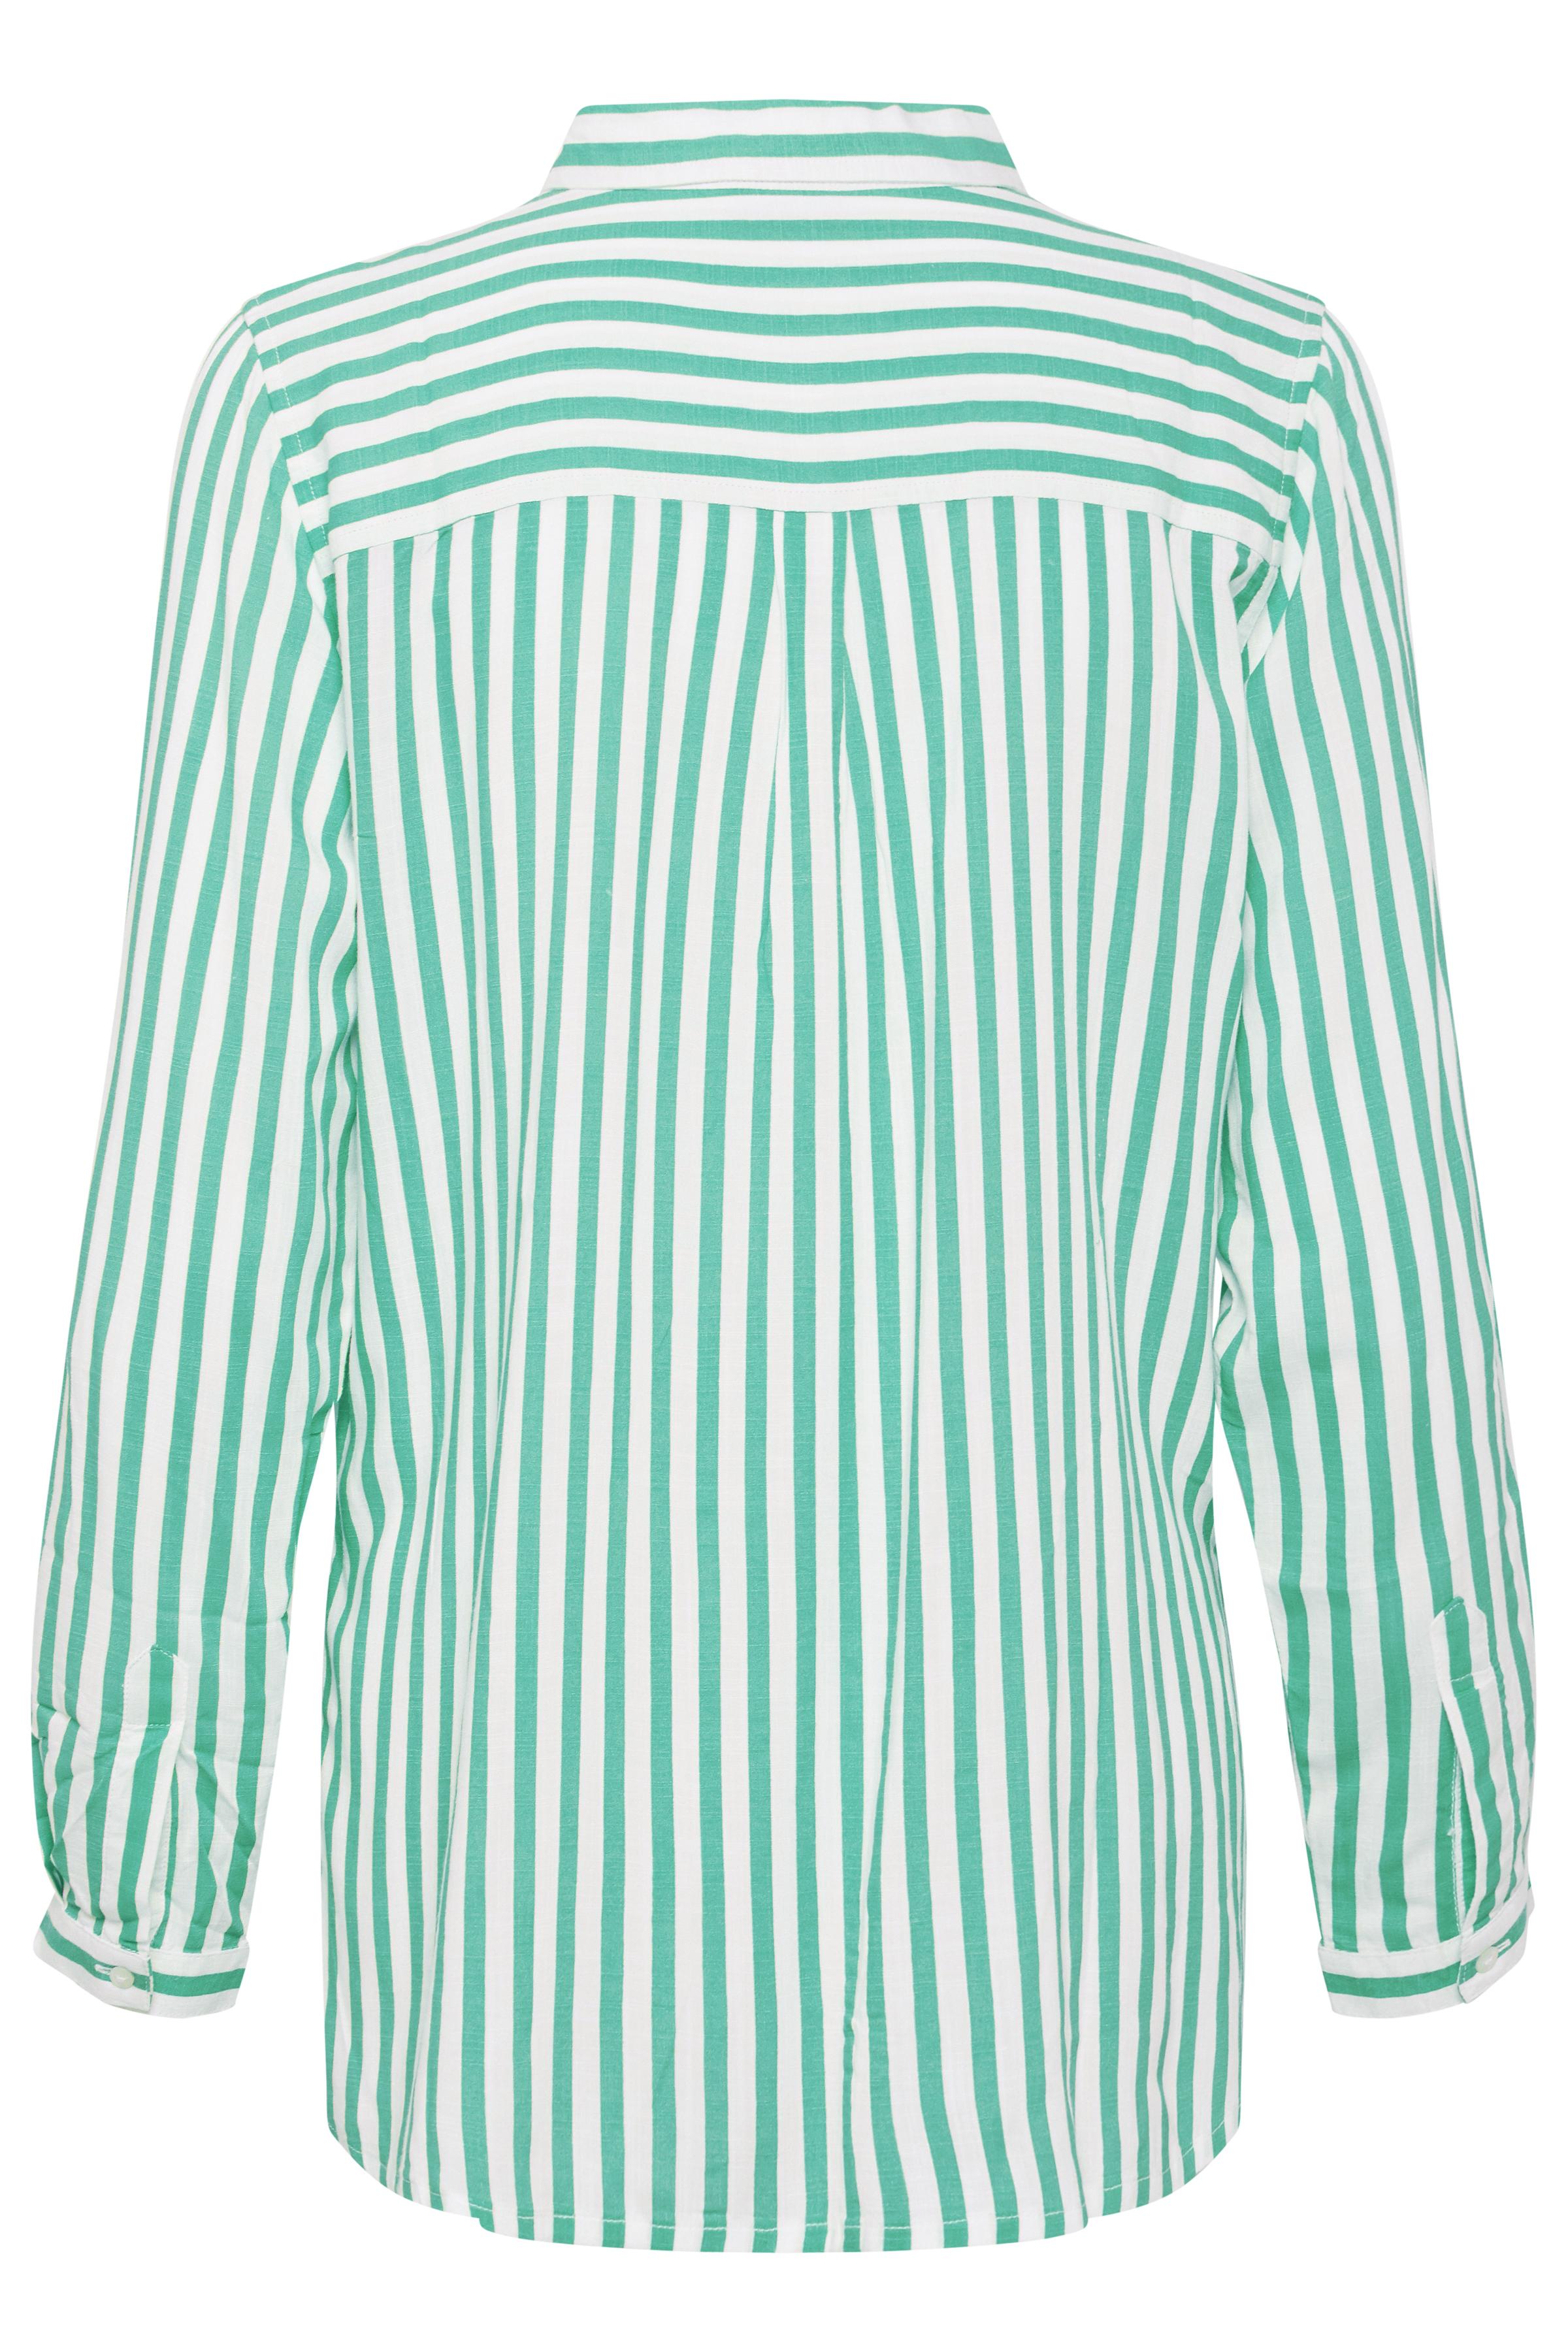 Fresh Green combi Langarm - Hemd von b.young – Kaufen Sie Fresh Green combi Langarm - Hemd aus Größe 34-44 hier